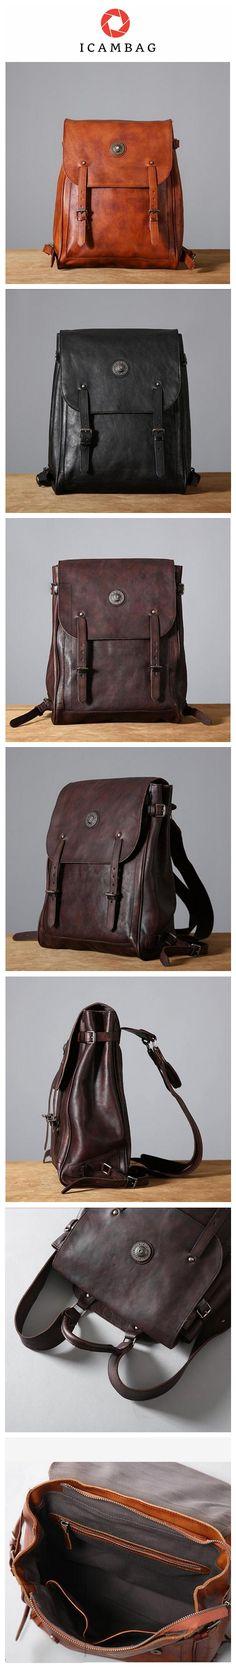 de2e6c0cda New Design Top Grain Leather Backpack